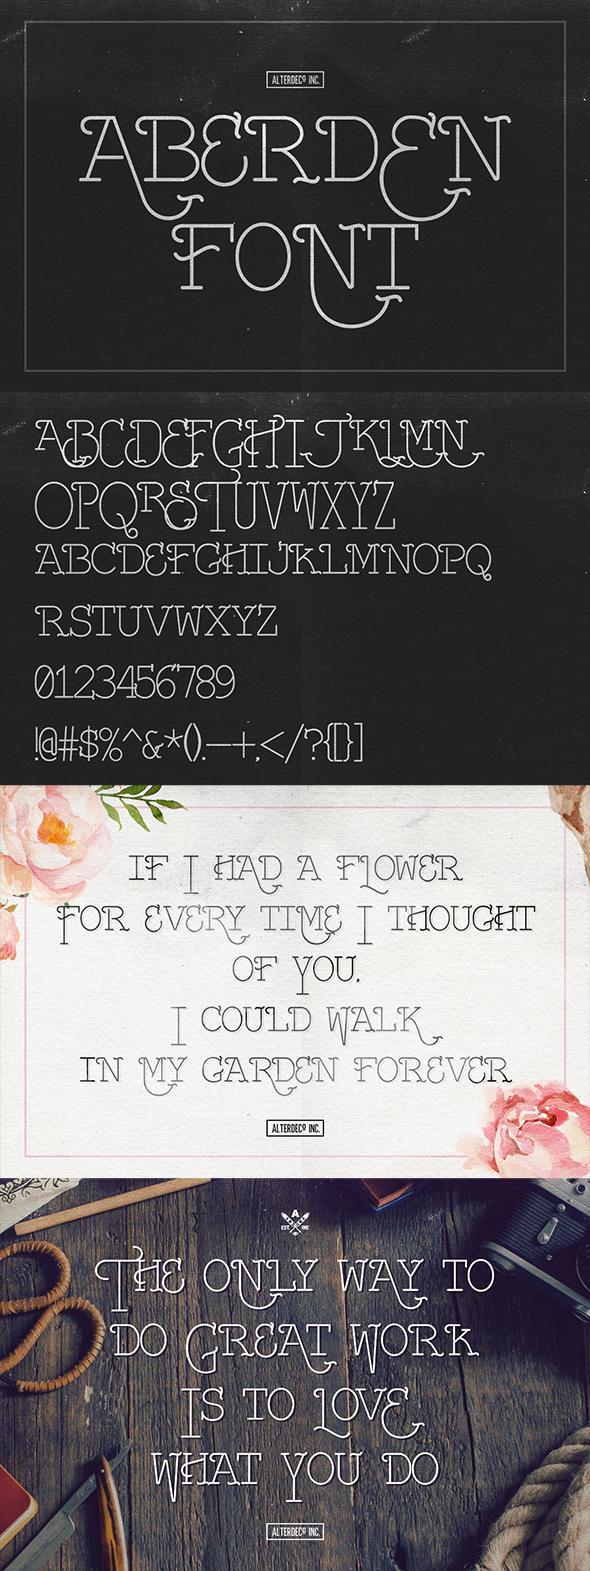 Free Font Aberden Typeface Download